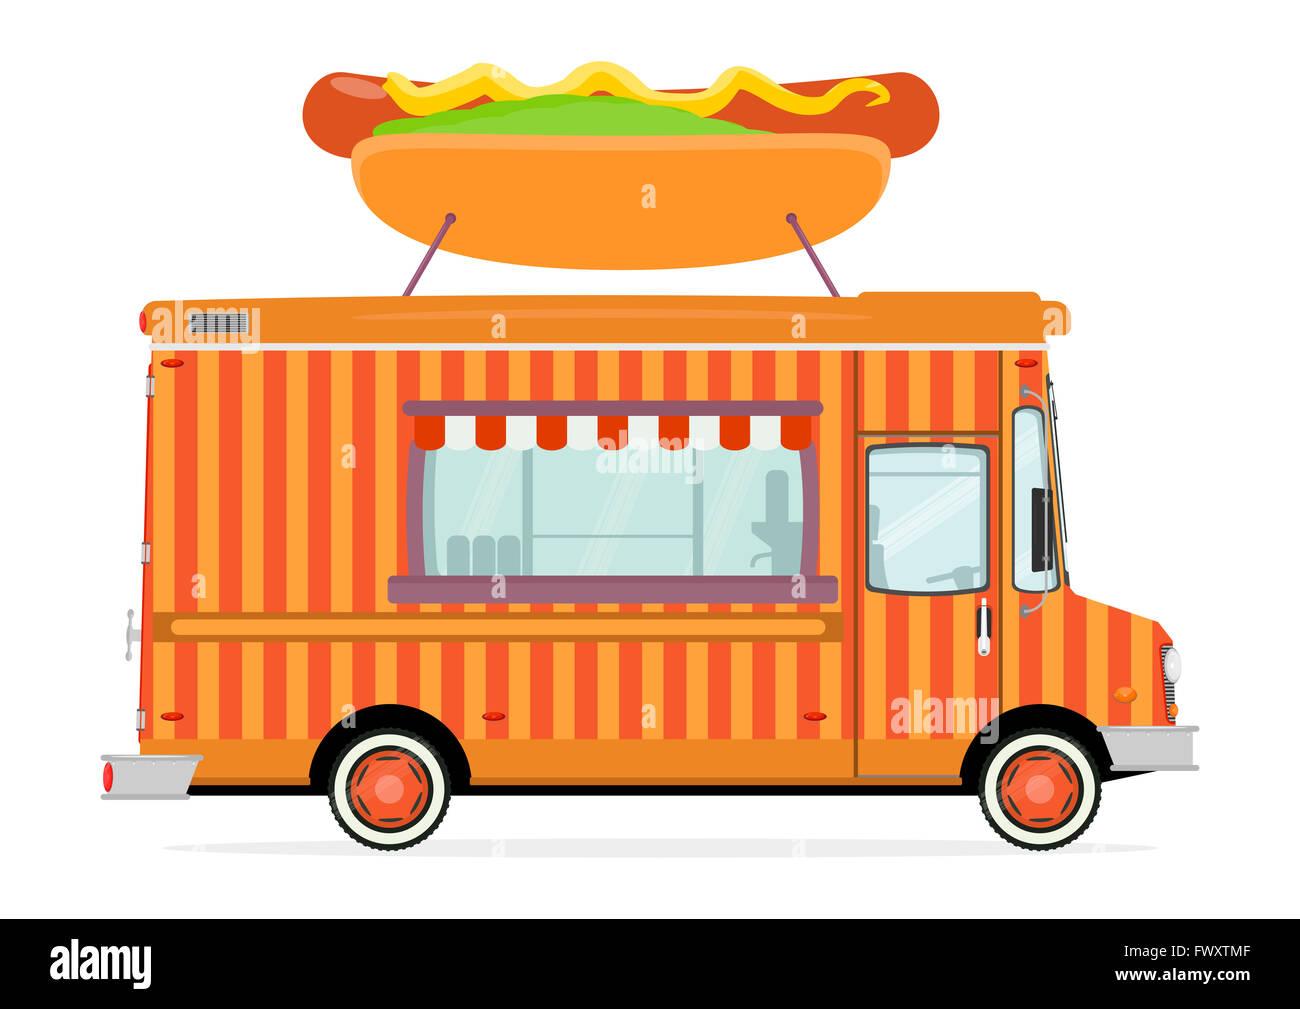 Street Meat Food Truck Menu